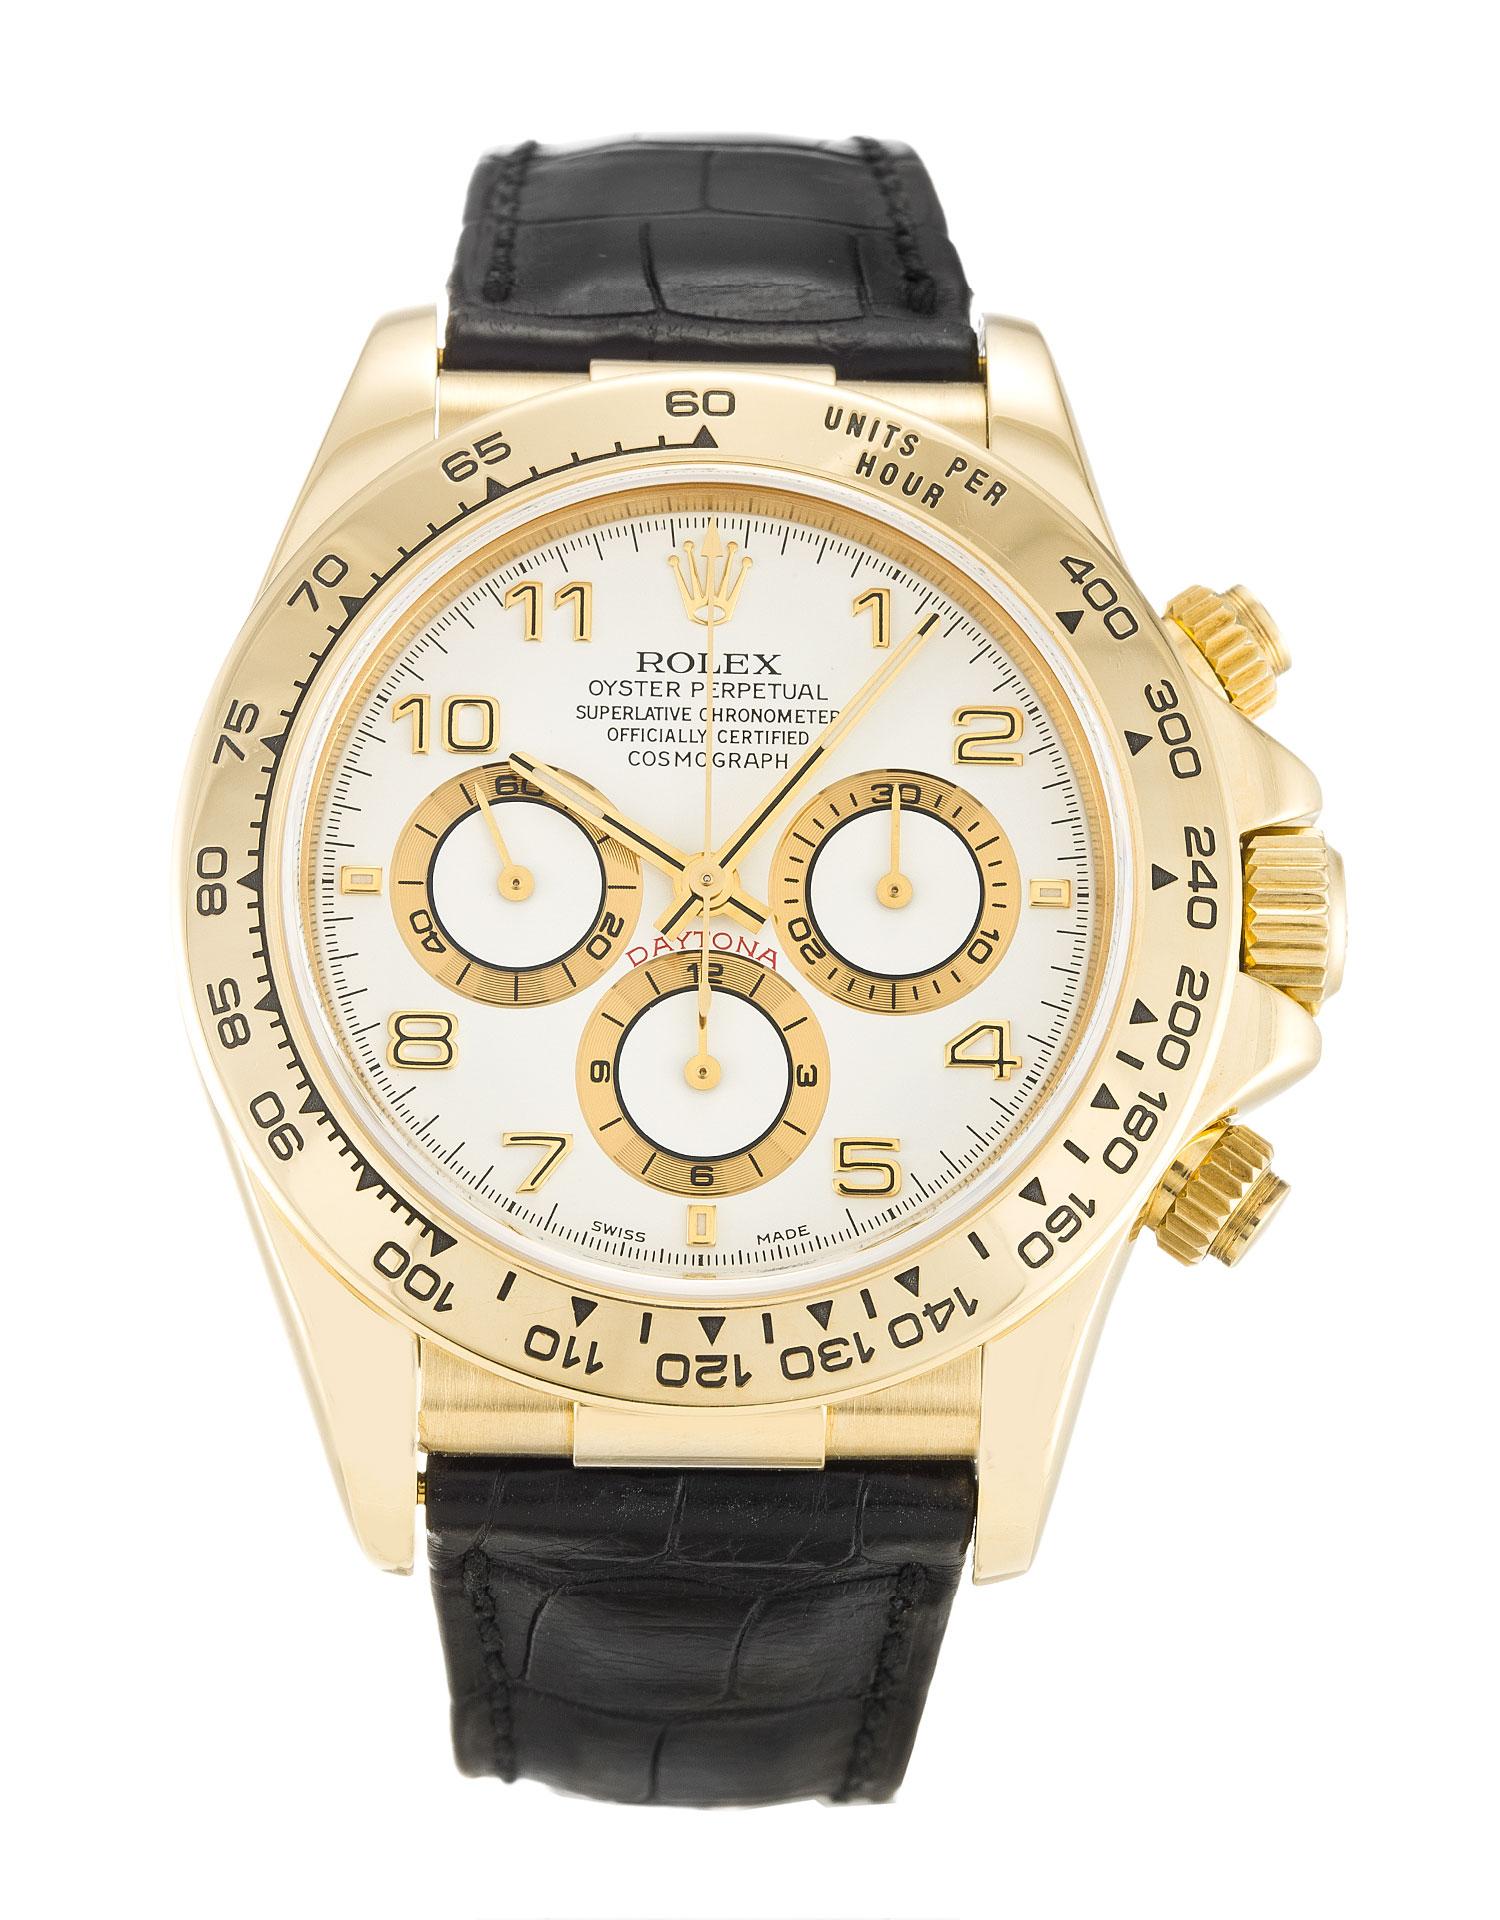 Rolex Cosmograph Daytona 16518 Yellow Gold White Dial width=500